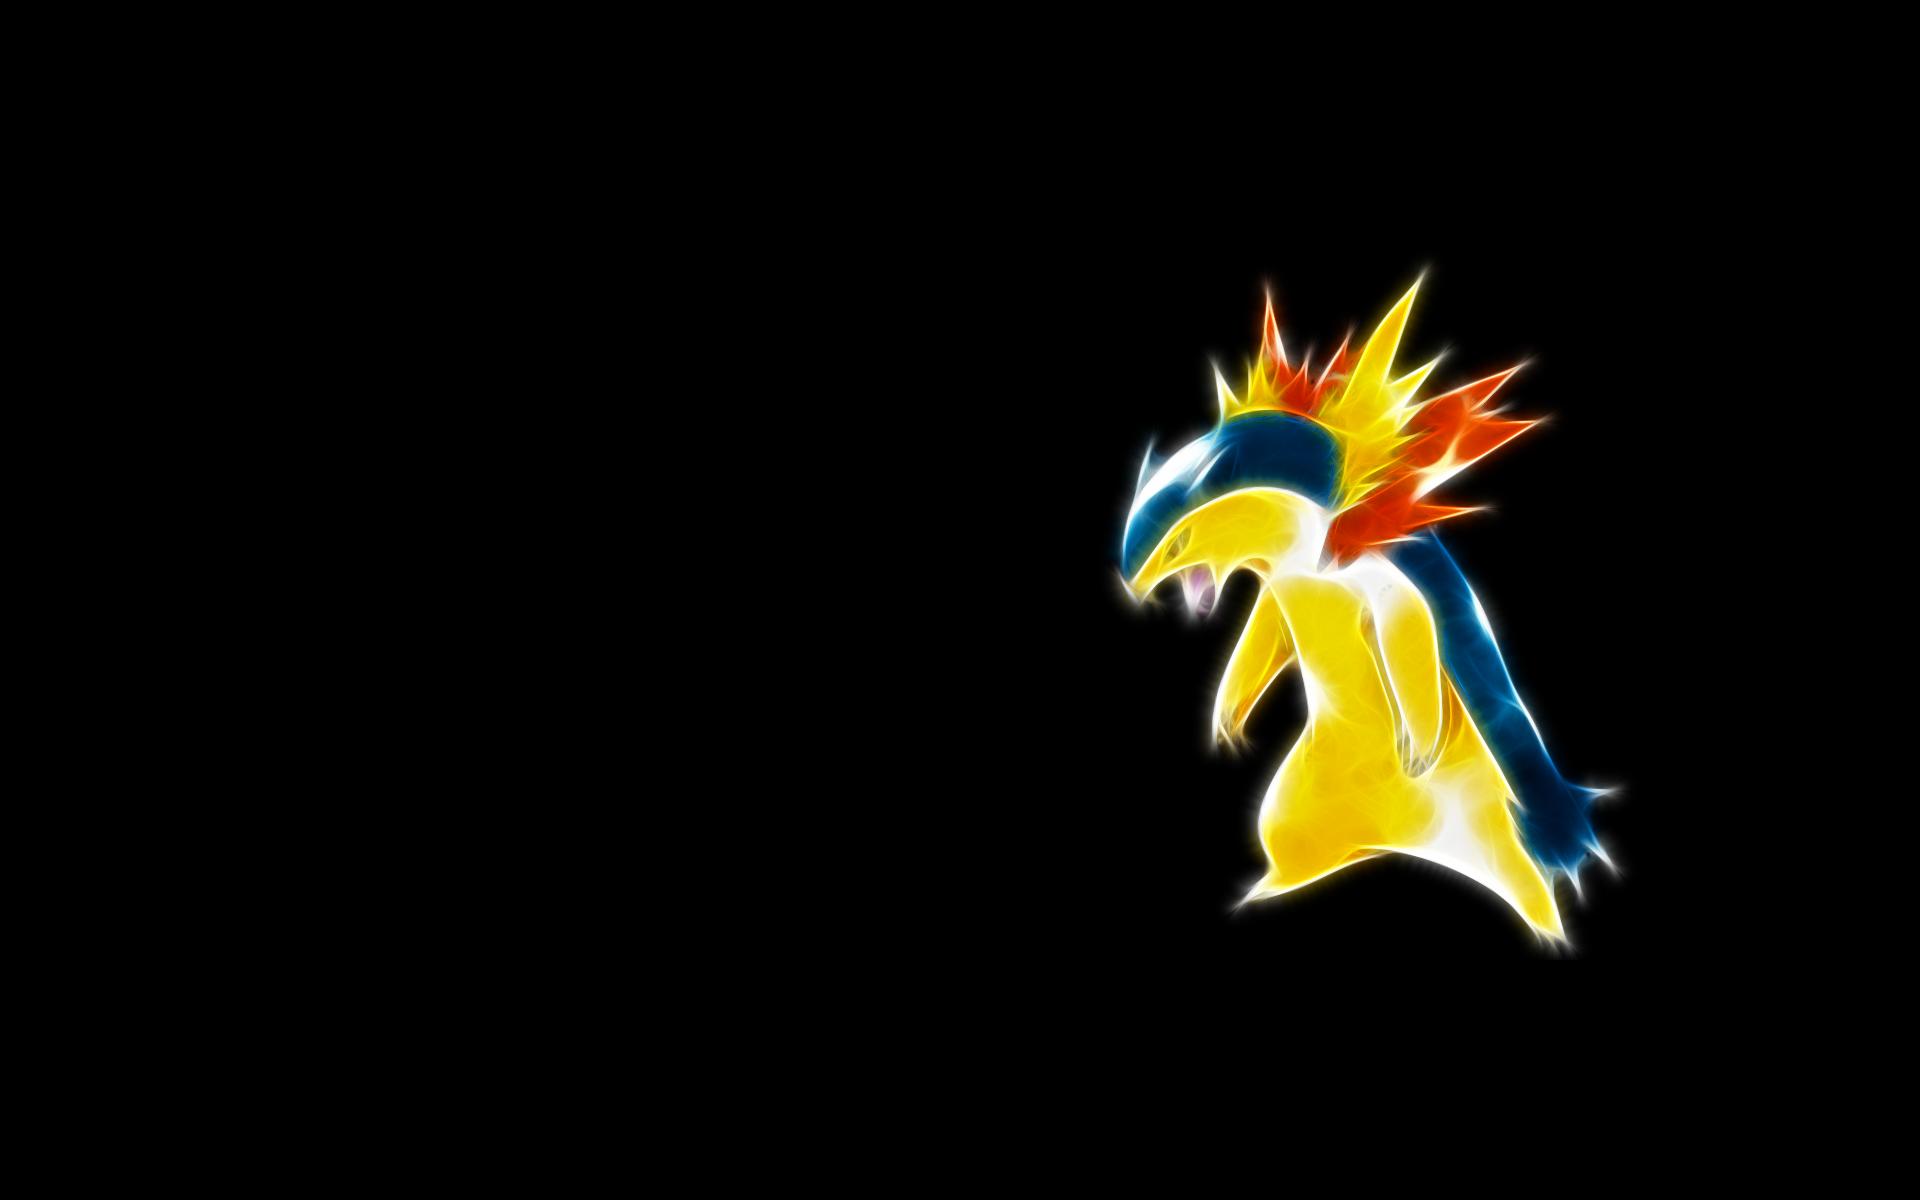 anime pokemon wallpapers hd - photo #43